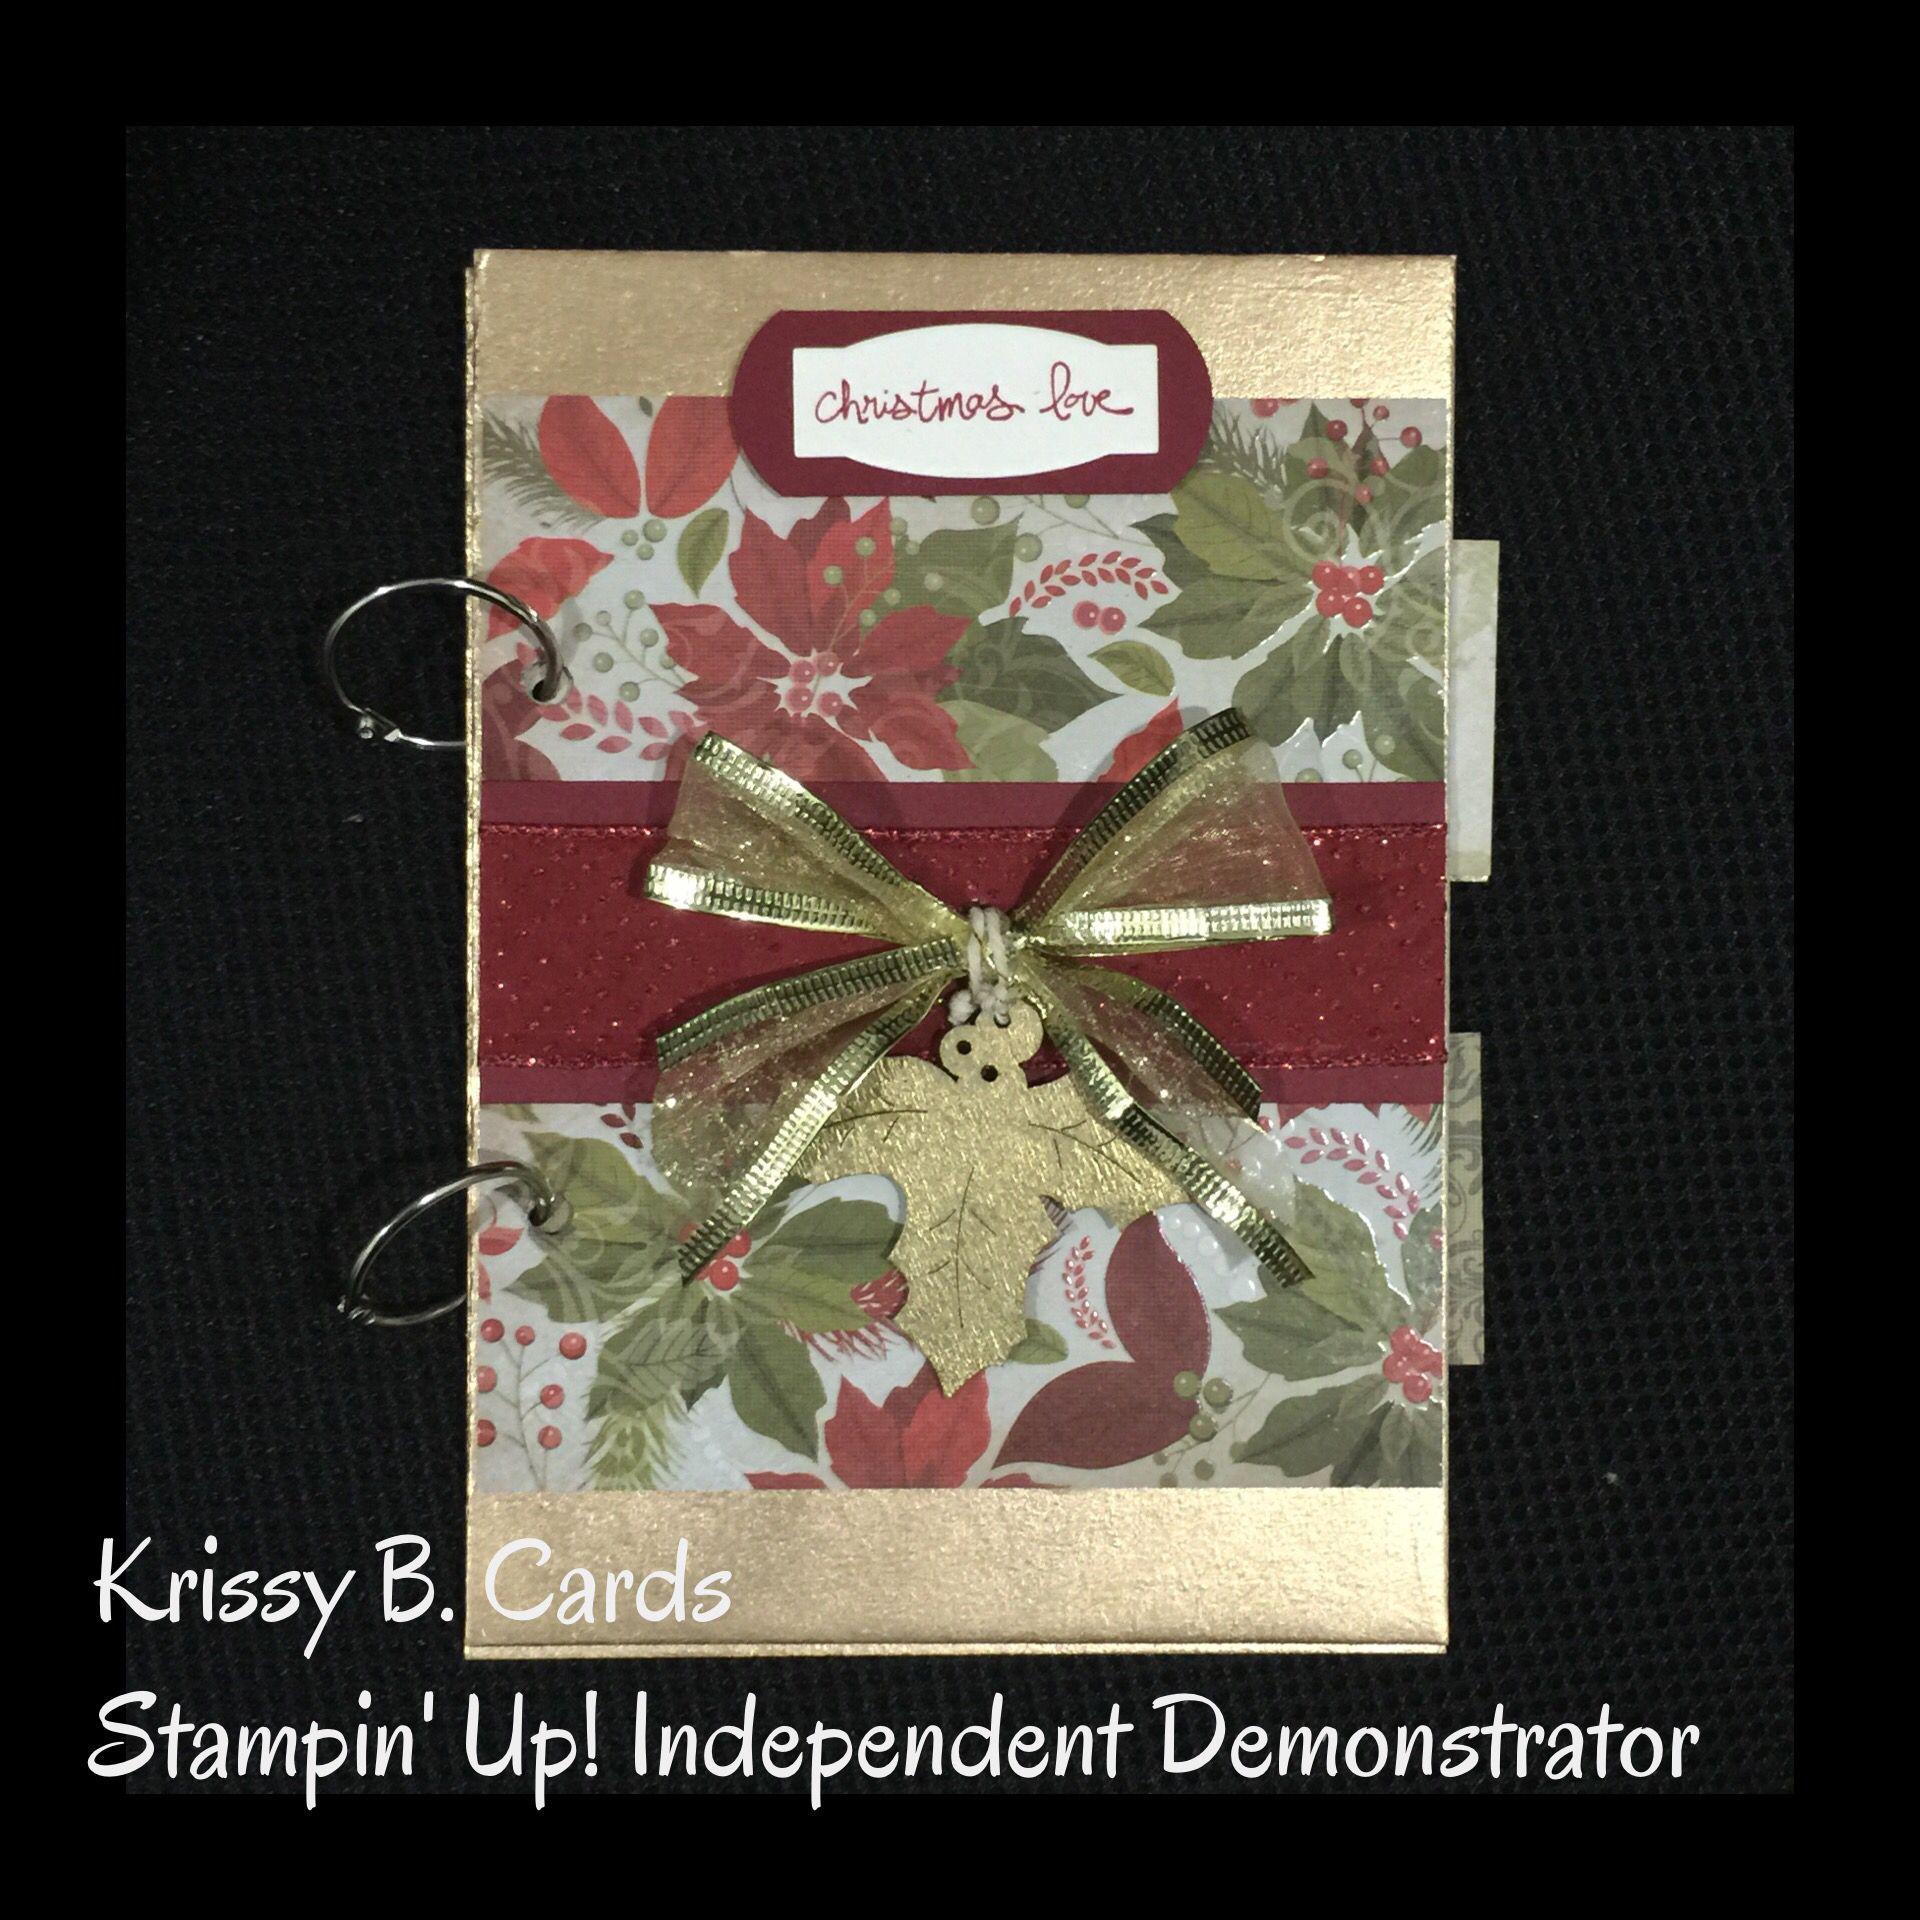 Christmas card keepsake album card keepsake albums pinterest christmas card keepsake album m4hsunfo